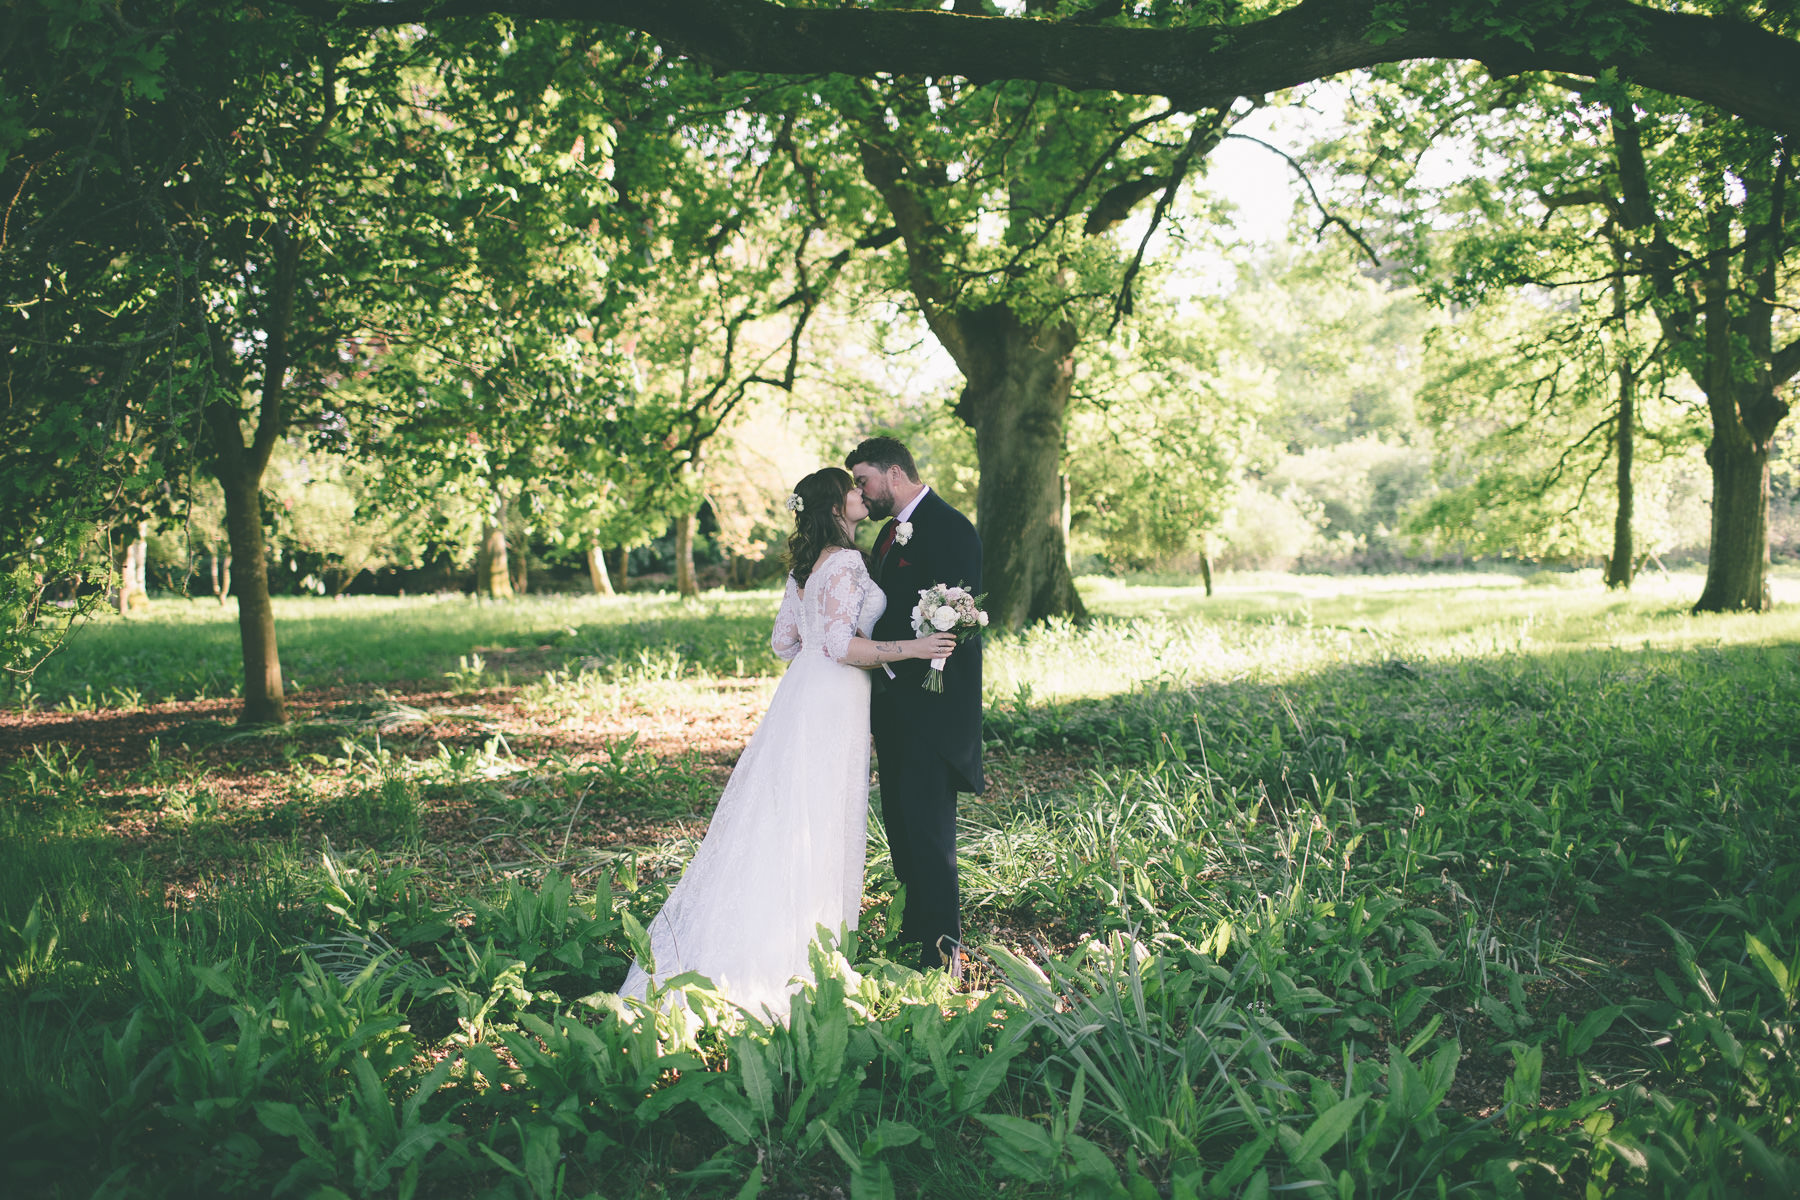 Pamber-Place-wedding-photography-basingstoke-hampshire-182